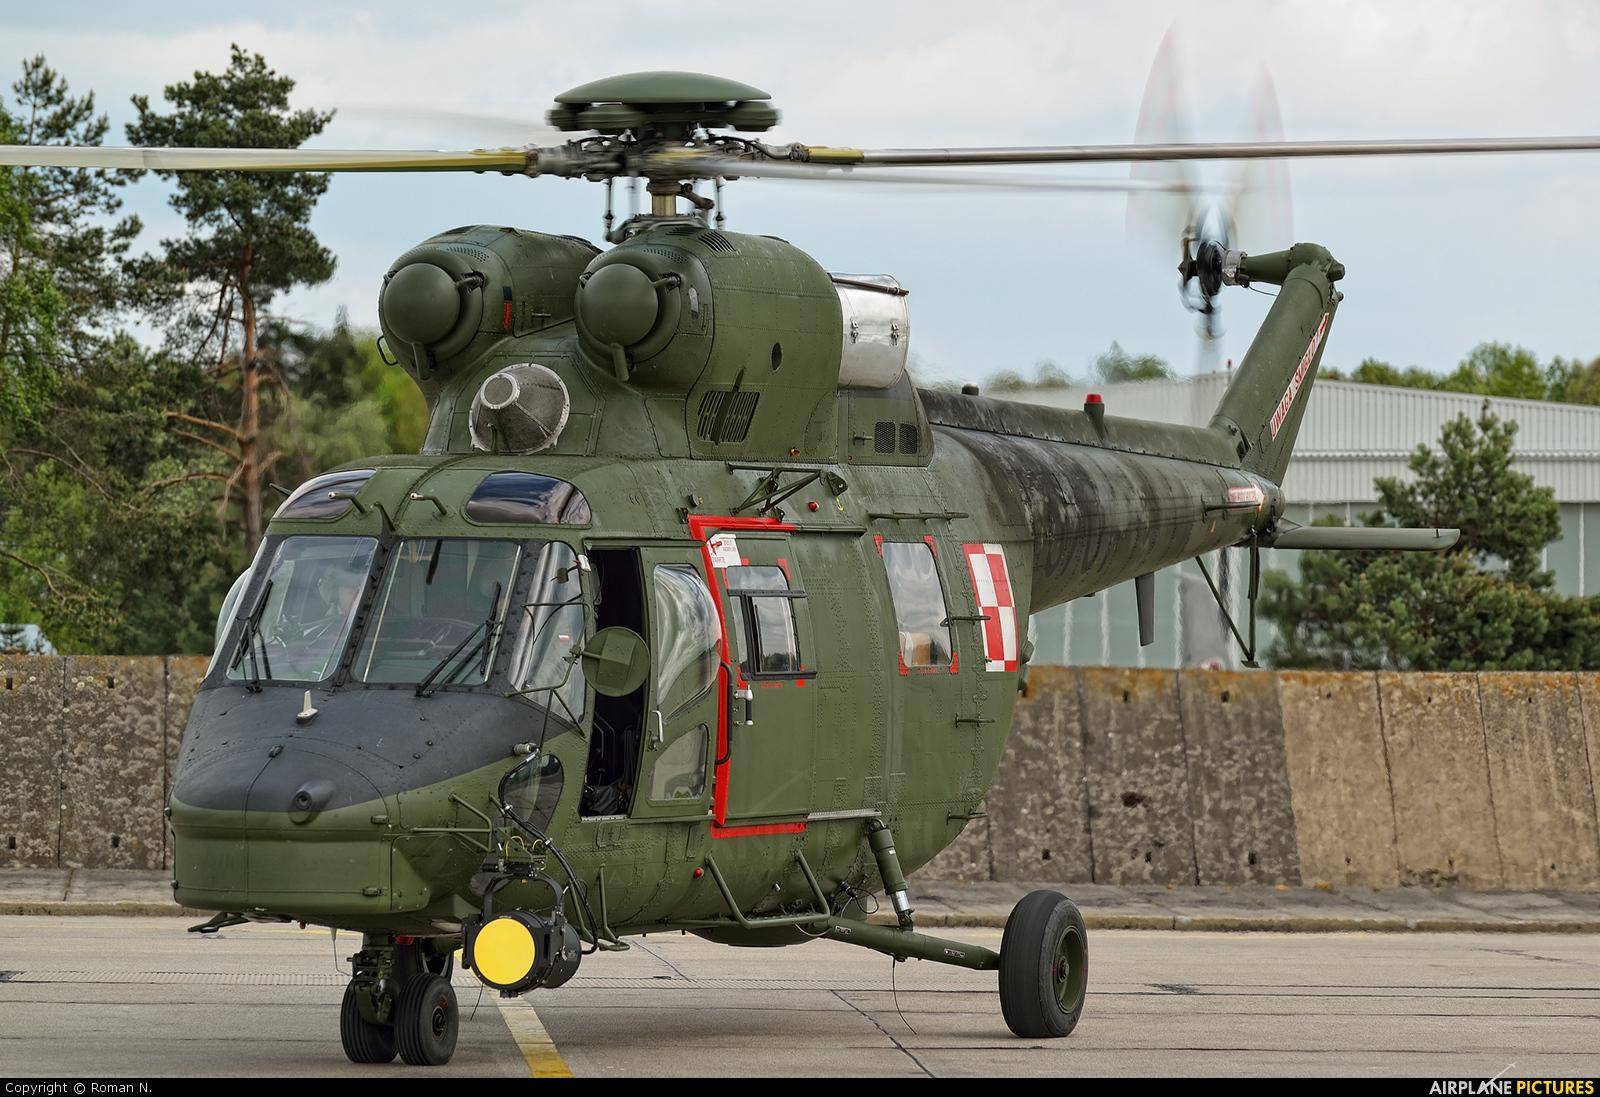 Poland - Air Force 0701 aircraft at Świdwin